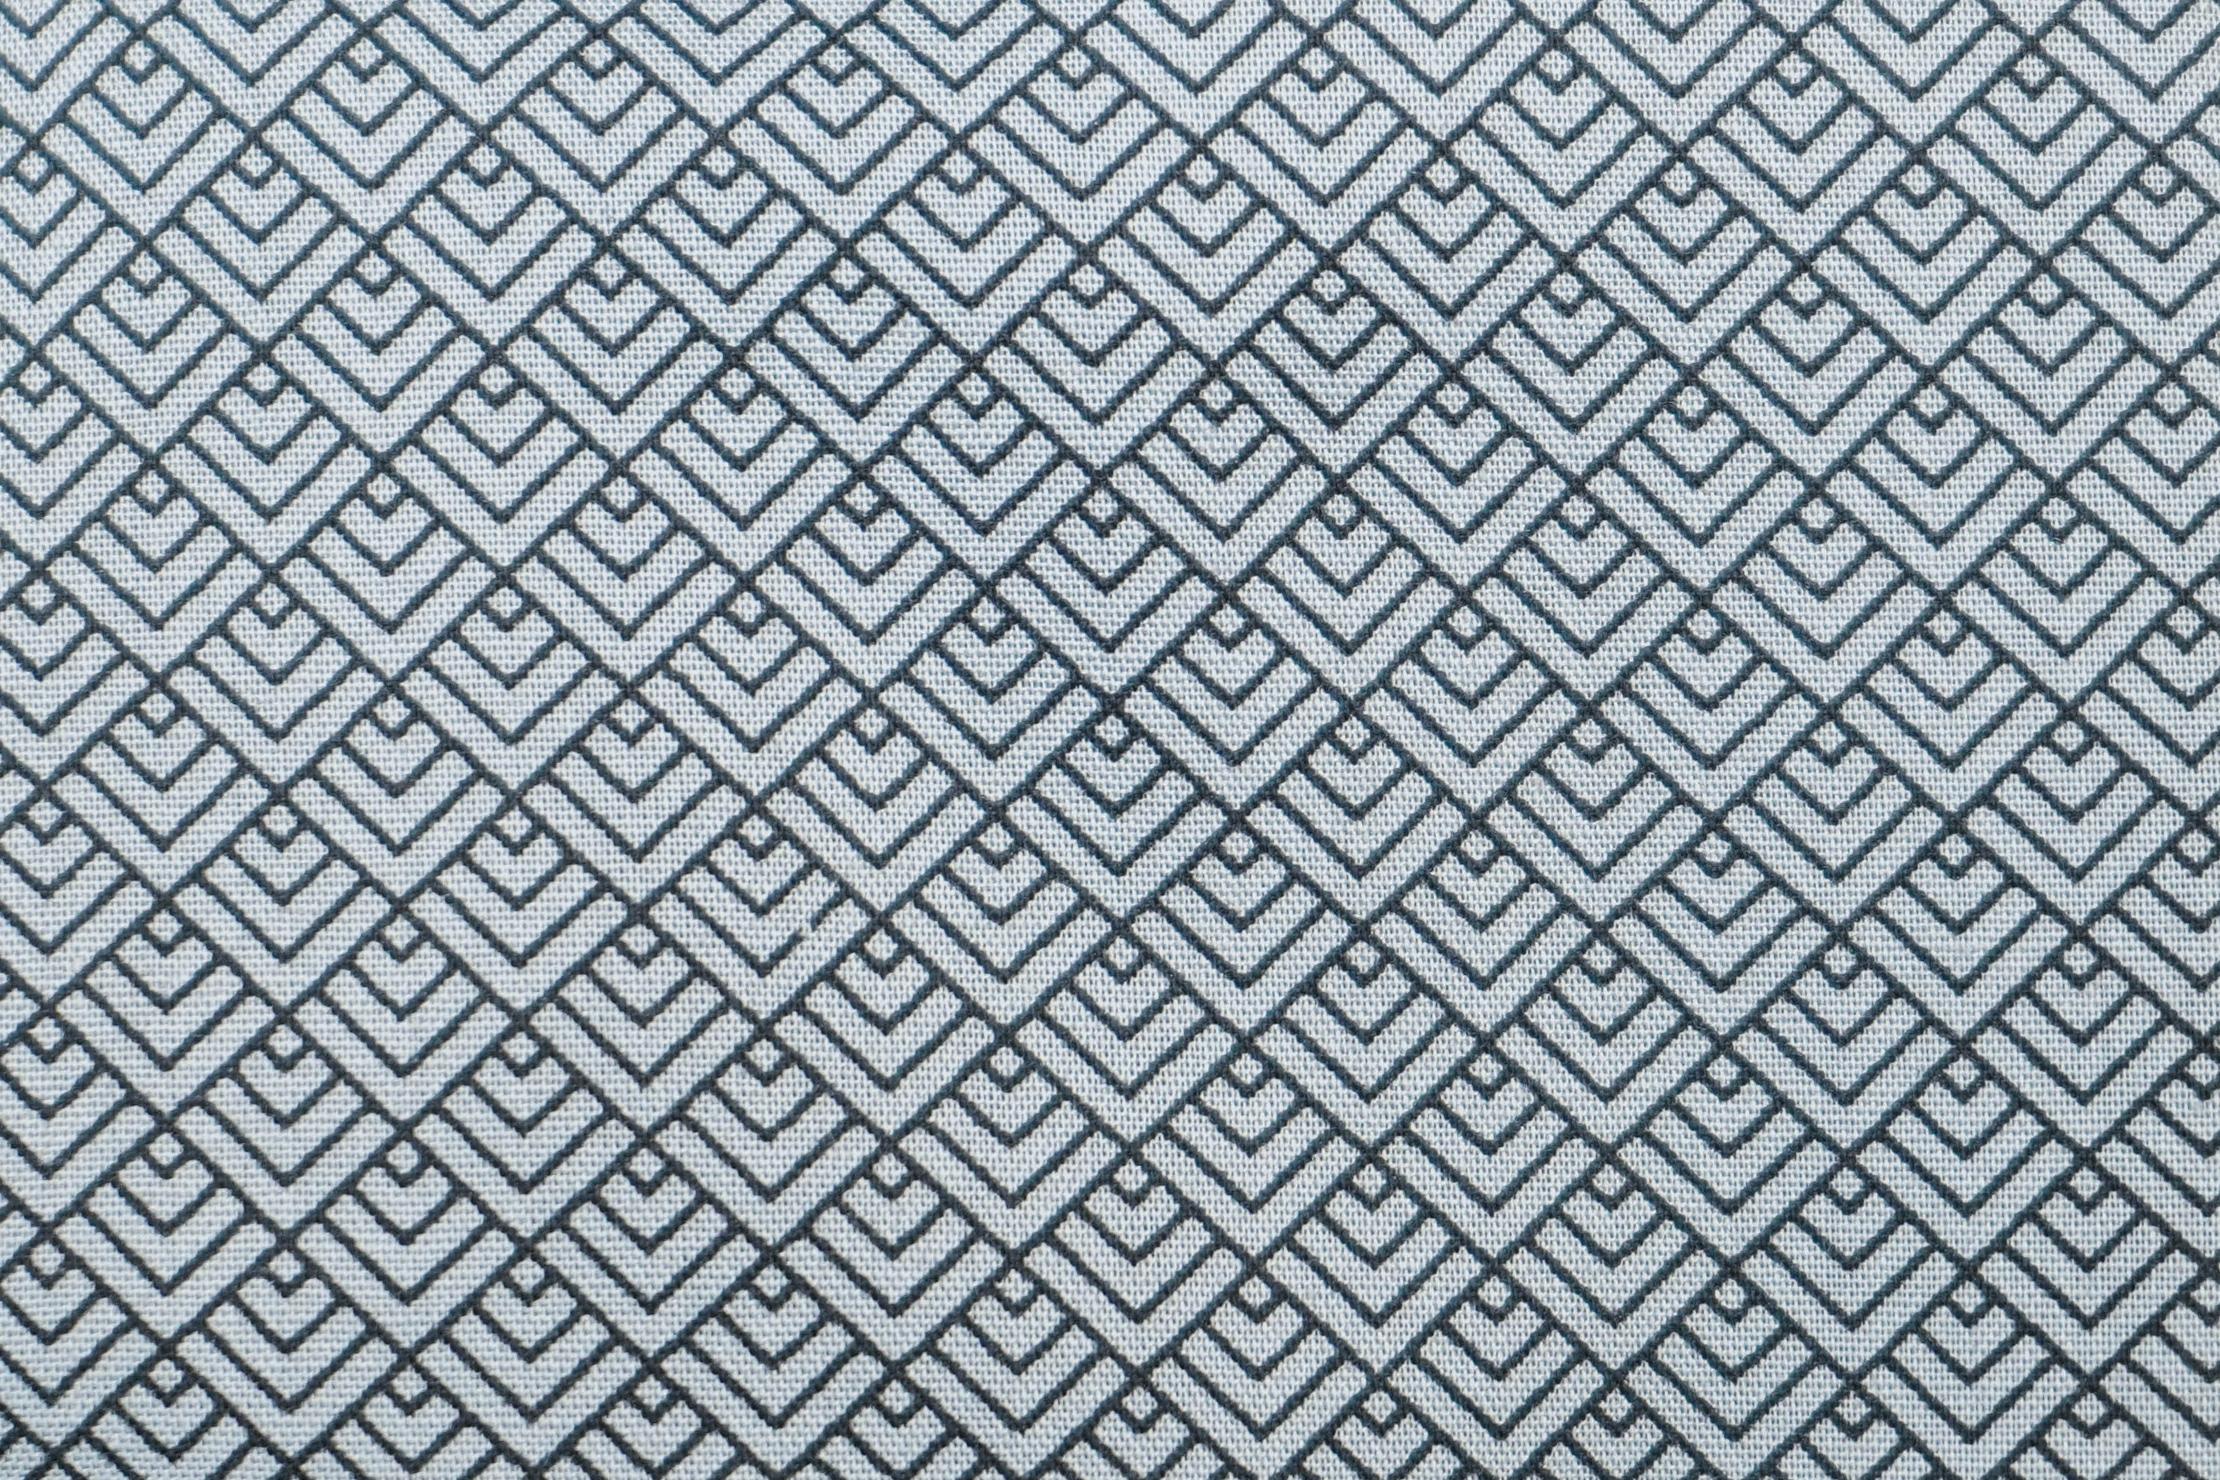 Bluffworks Gramercy Suit Pocket Pattern